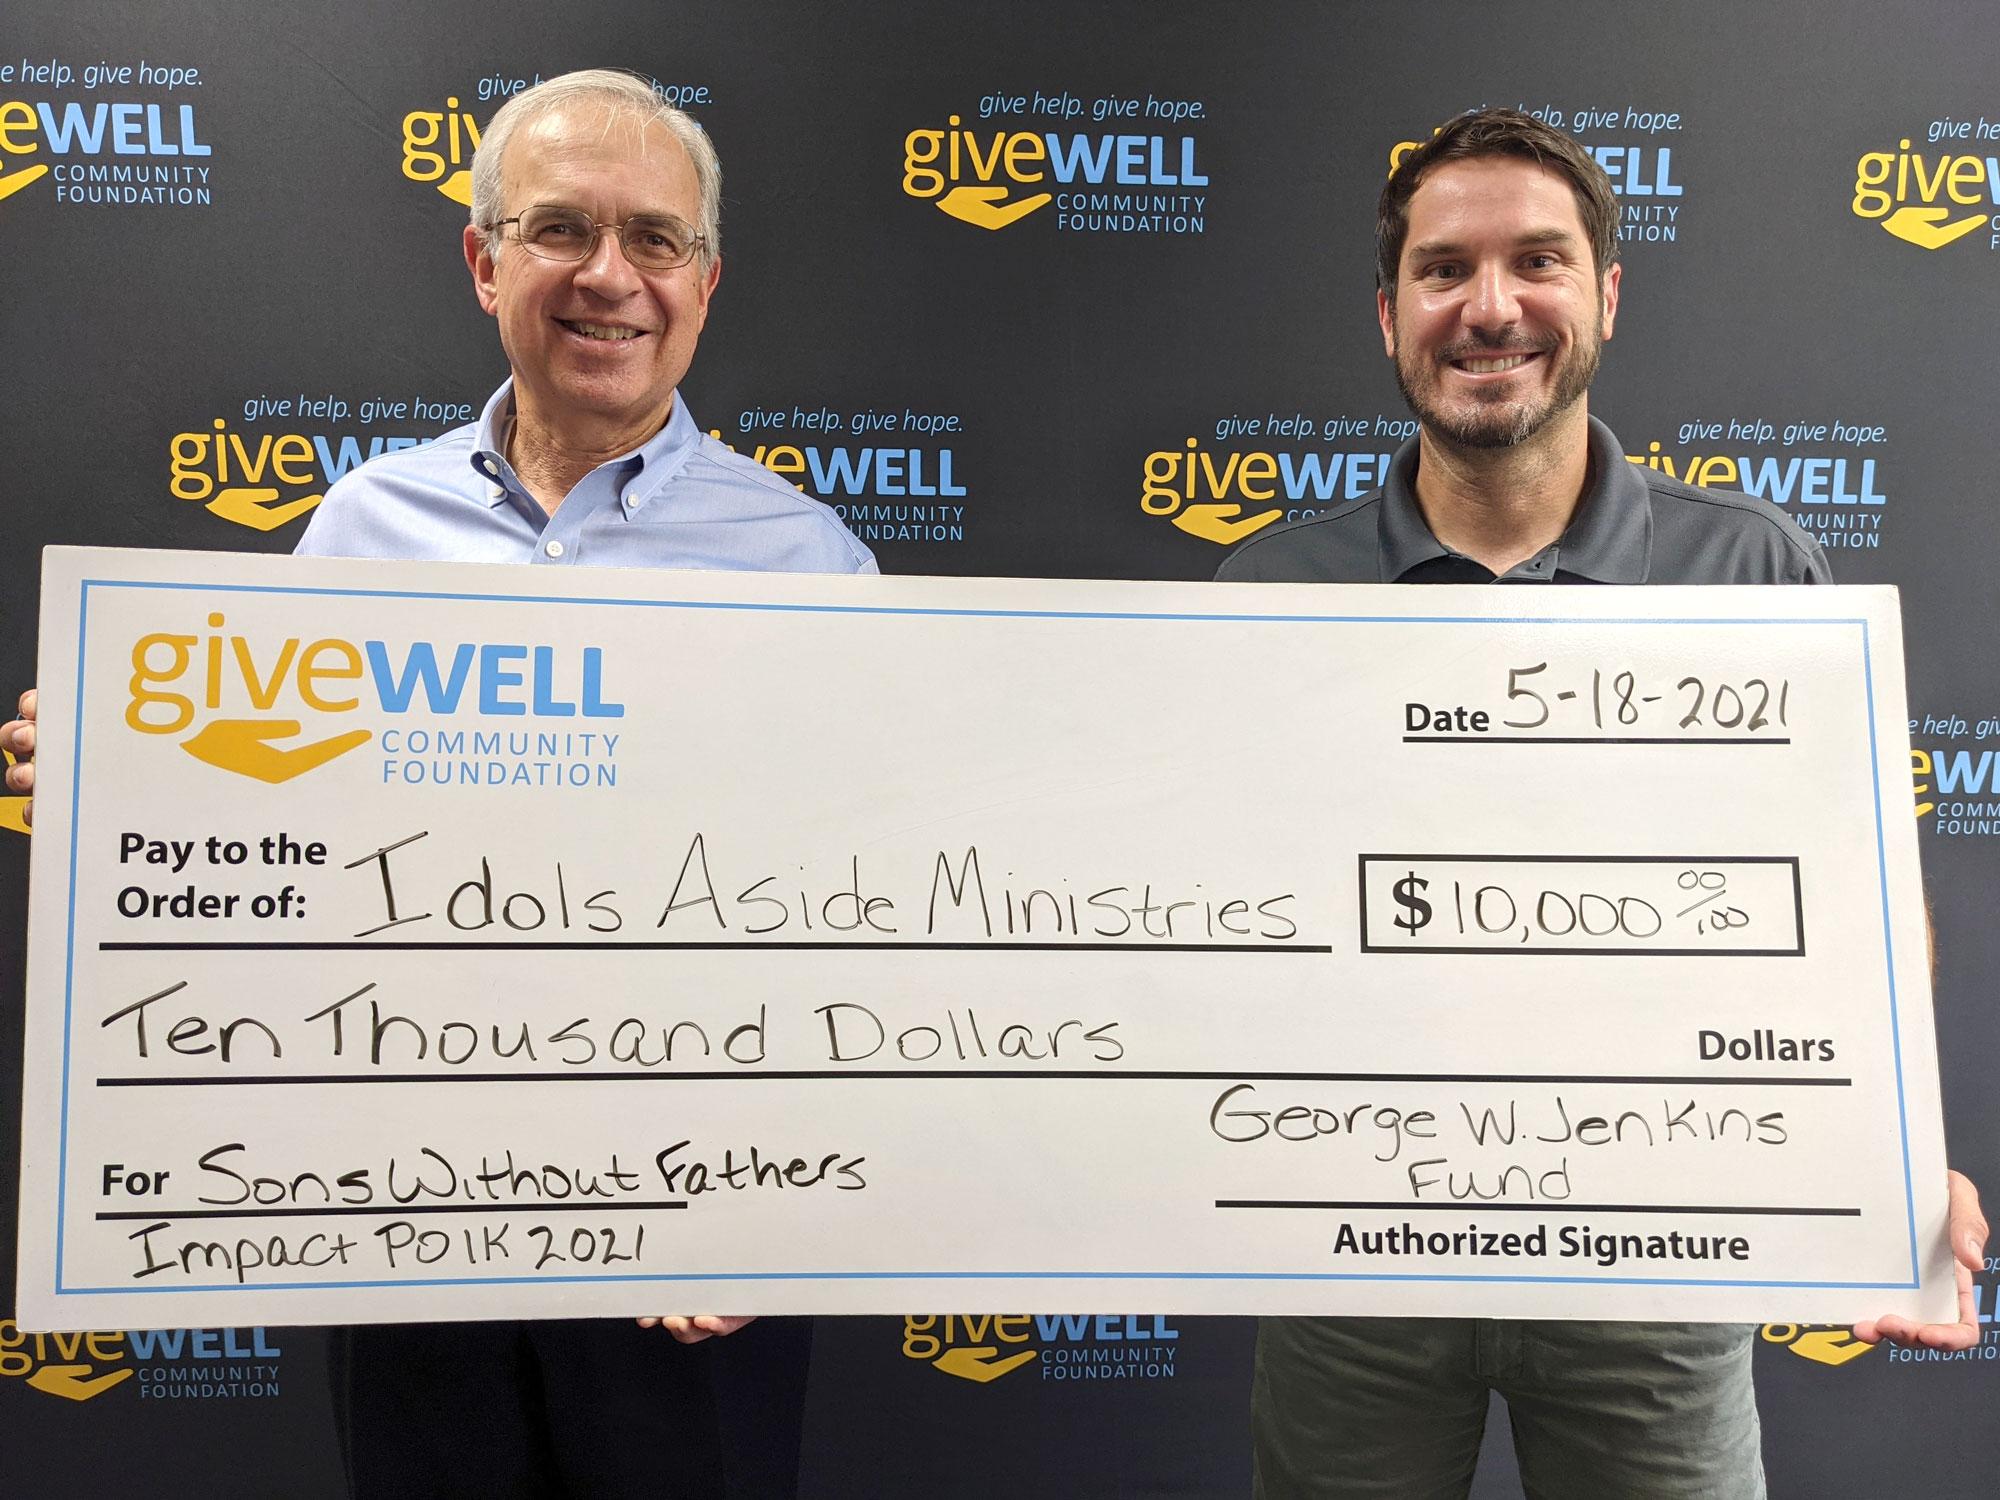 Impact Polk check presentation with Idols Aside Ministries